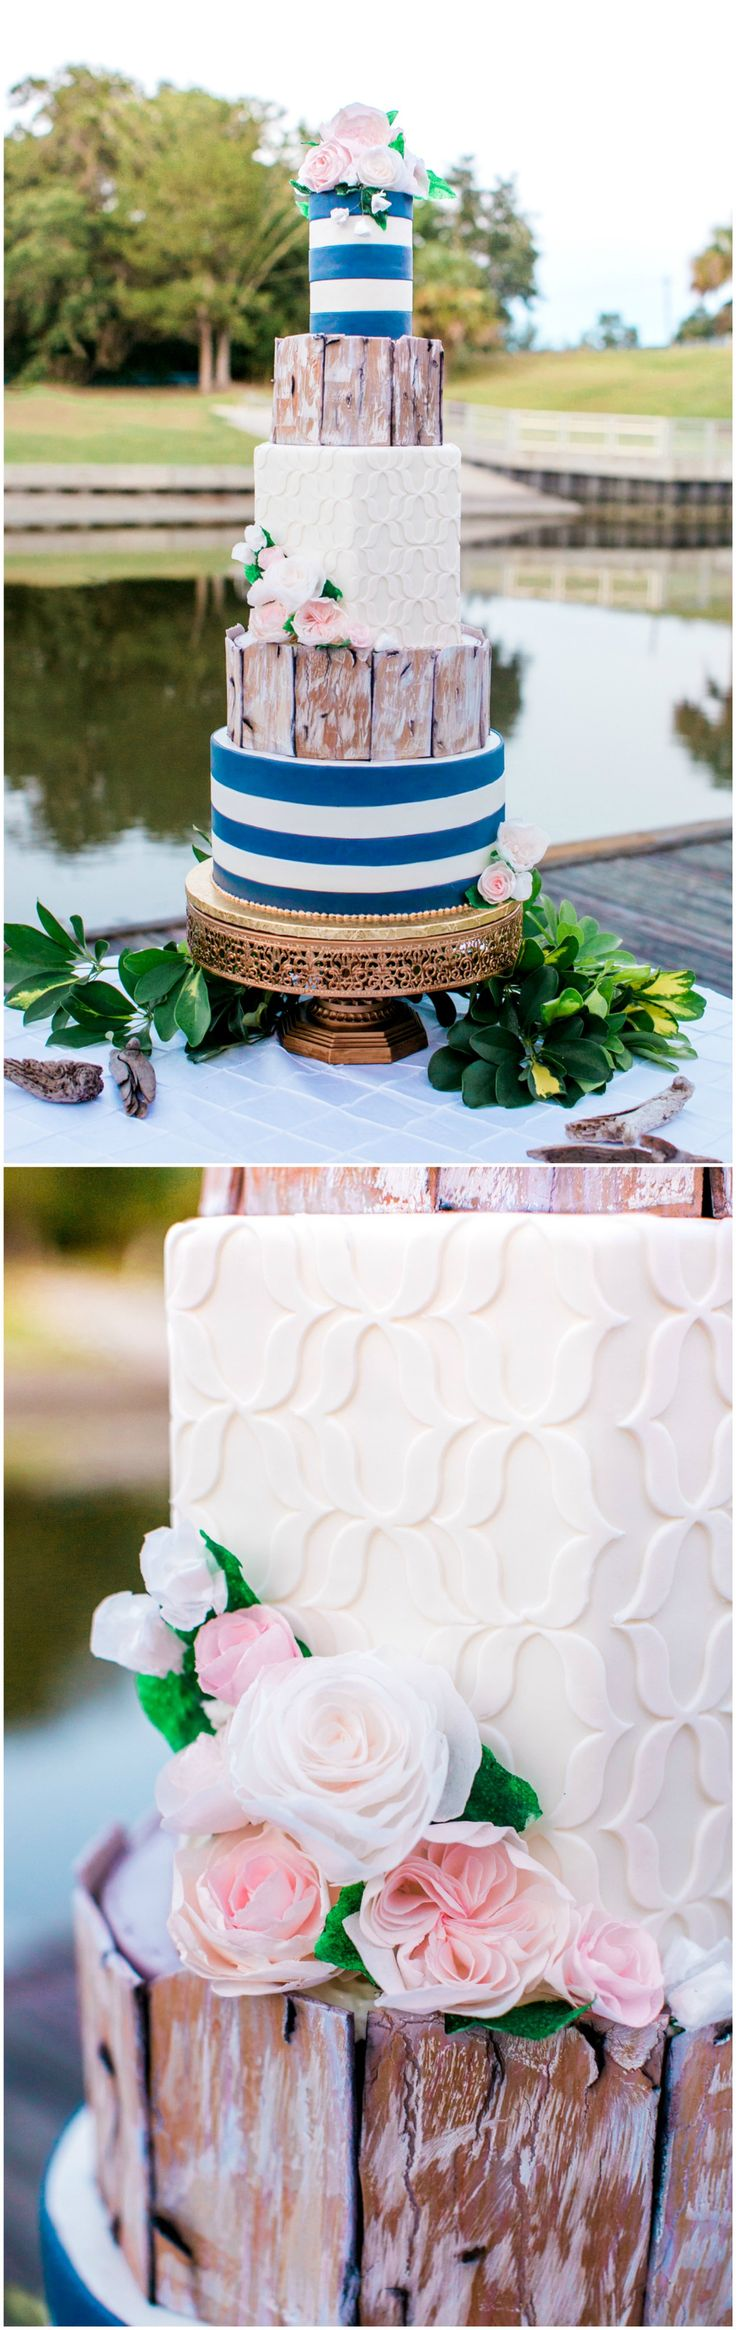 Best Tall Wedding Cakes Ideas On Pinterest Gold Tall Wedding